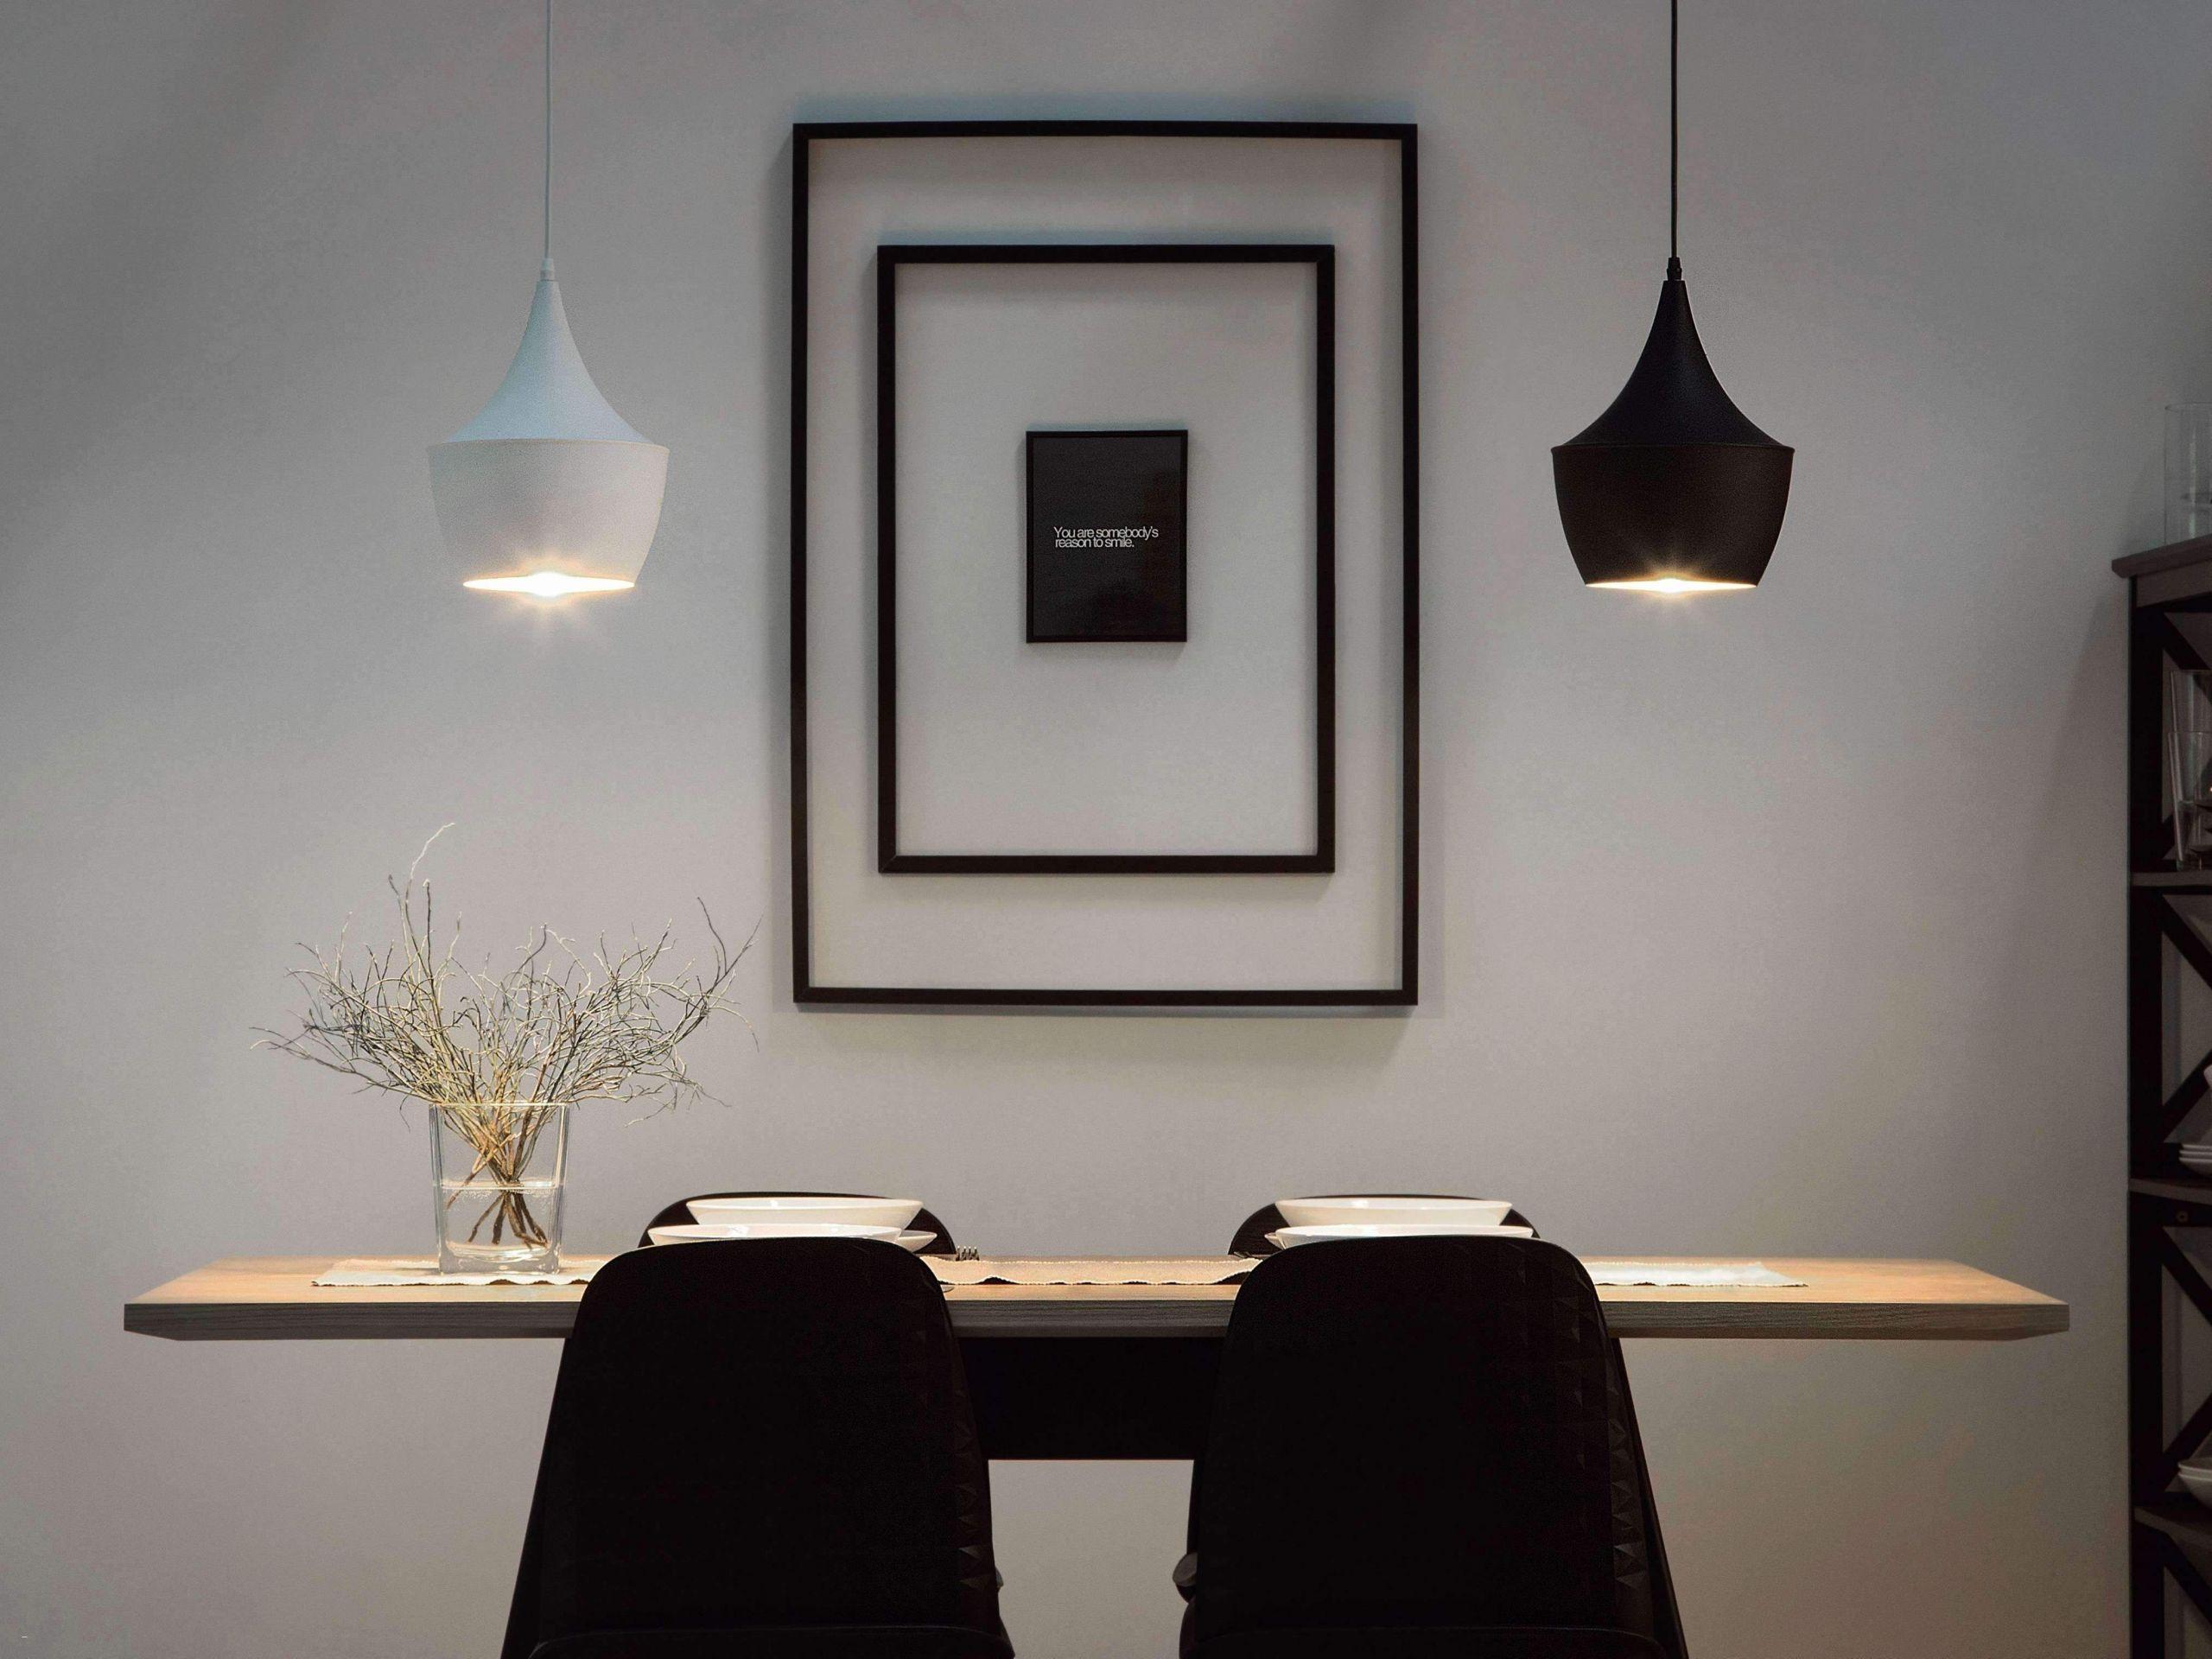 Full Size of Wohnzimmer Led Lampe 31 Luxus Schn Frisch Badezimmer Stehlampe Sofa Kunstleder Deckenleuchten Wandbild Tischlampe Big Leder Deckenleuchte Deckenlampen Komplett Wohnzimmer Wohnzimmer Led Lampe